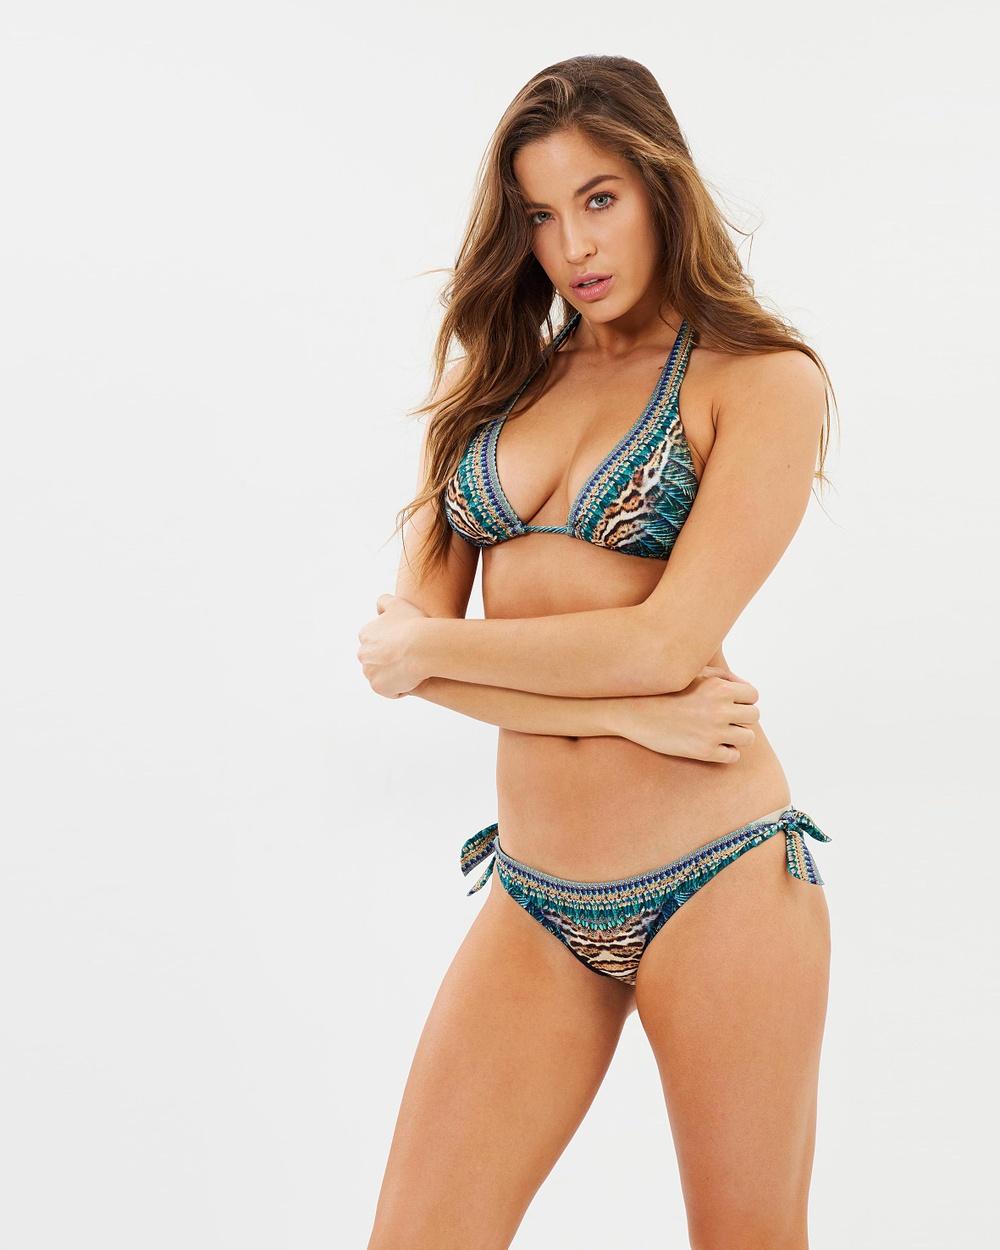 Camilla Tab Tie Pants Bikini Bottoms The Creator Tab Tie Pants